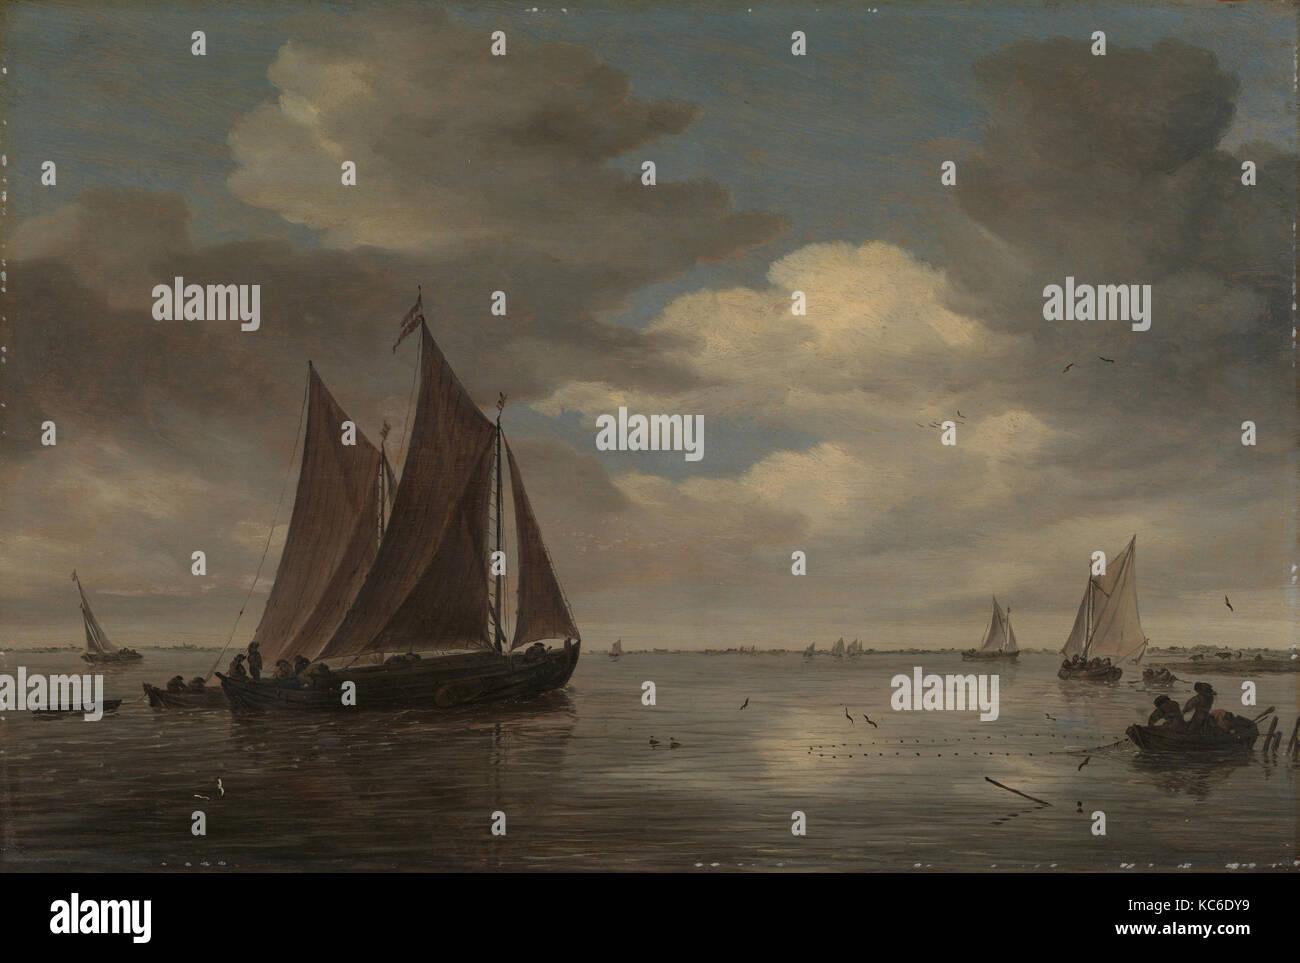 Fishing Boats on a River, Salomon van Ruysdael, early 1660s Stock Photo